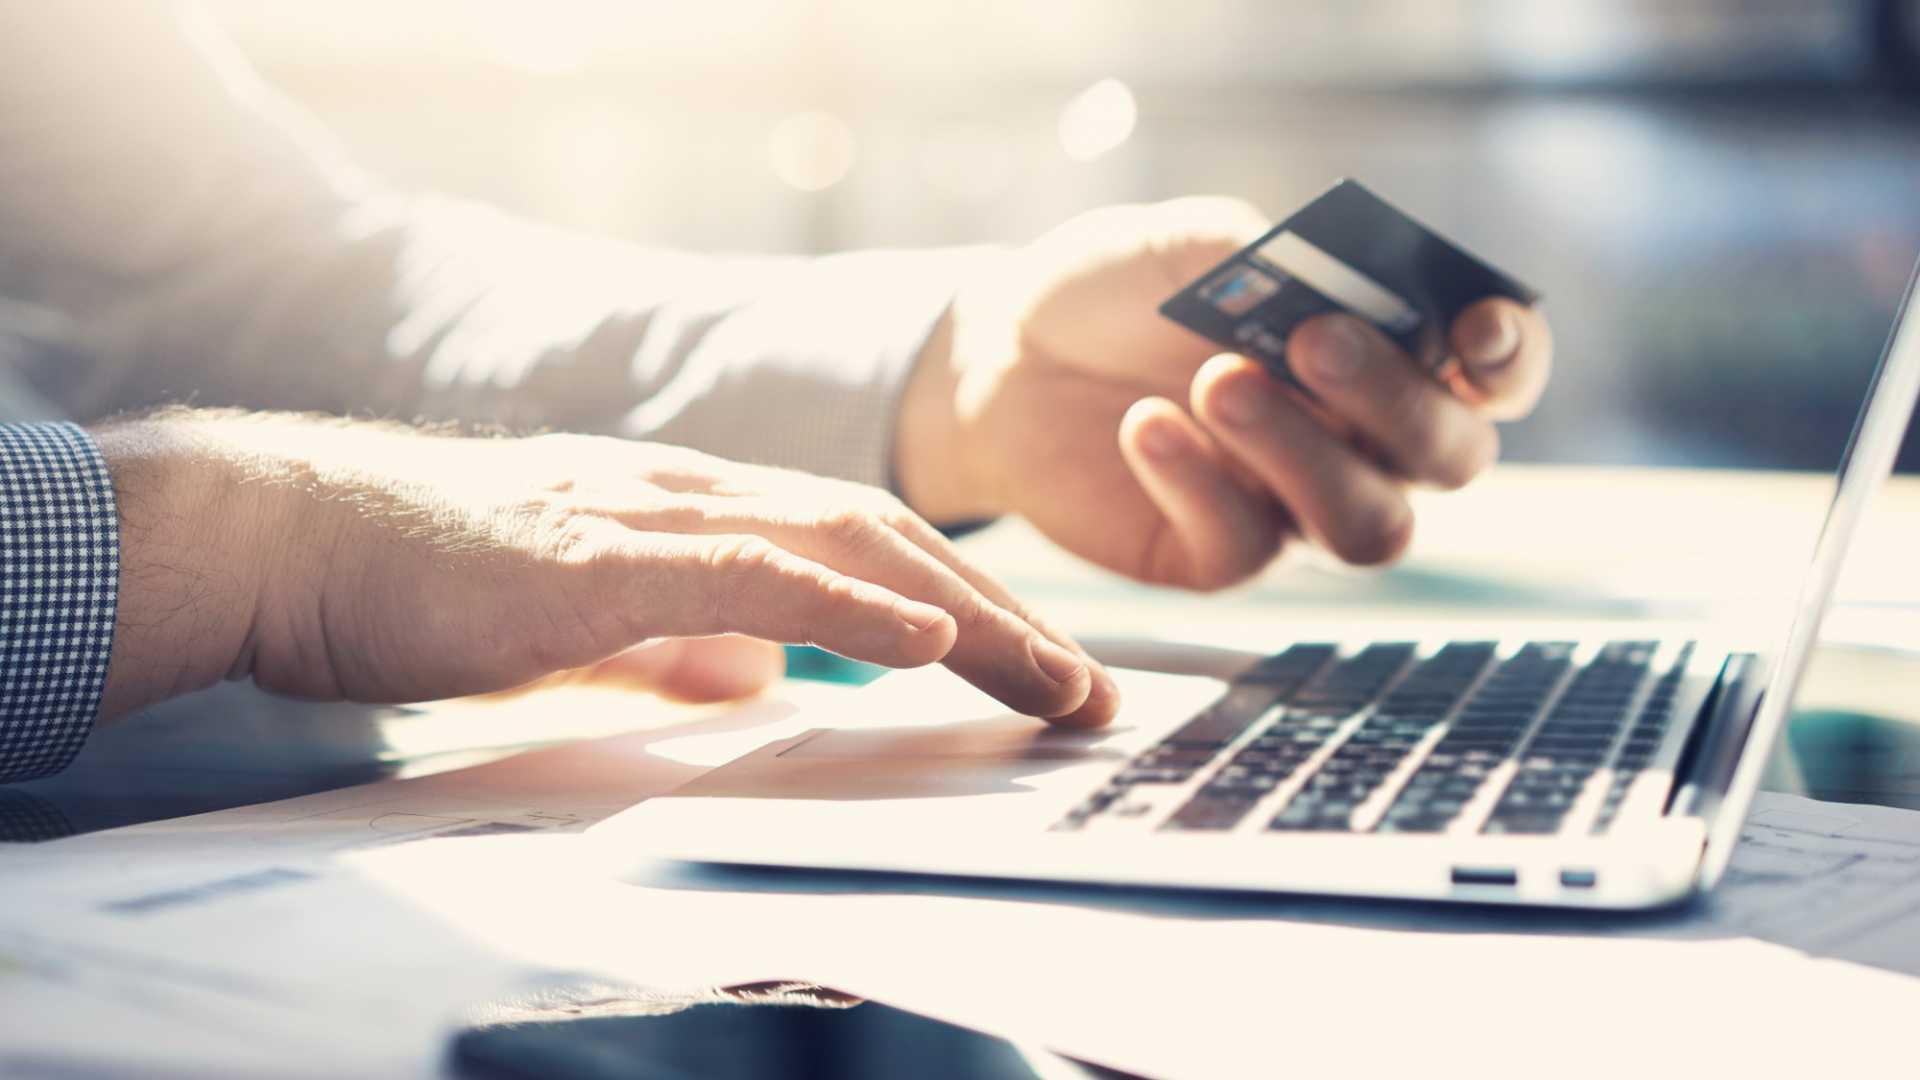 4 Ways to Invest in Omnichannel in 2018